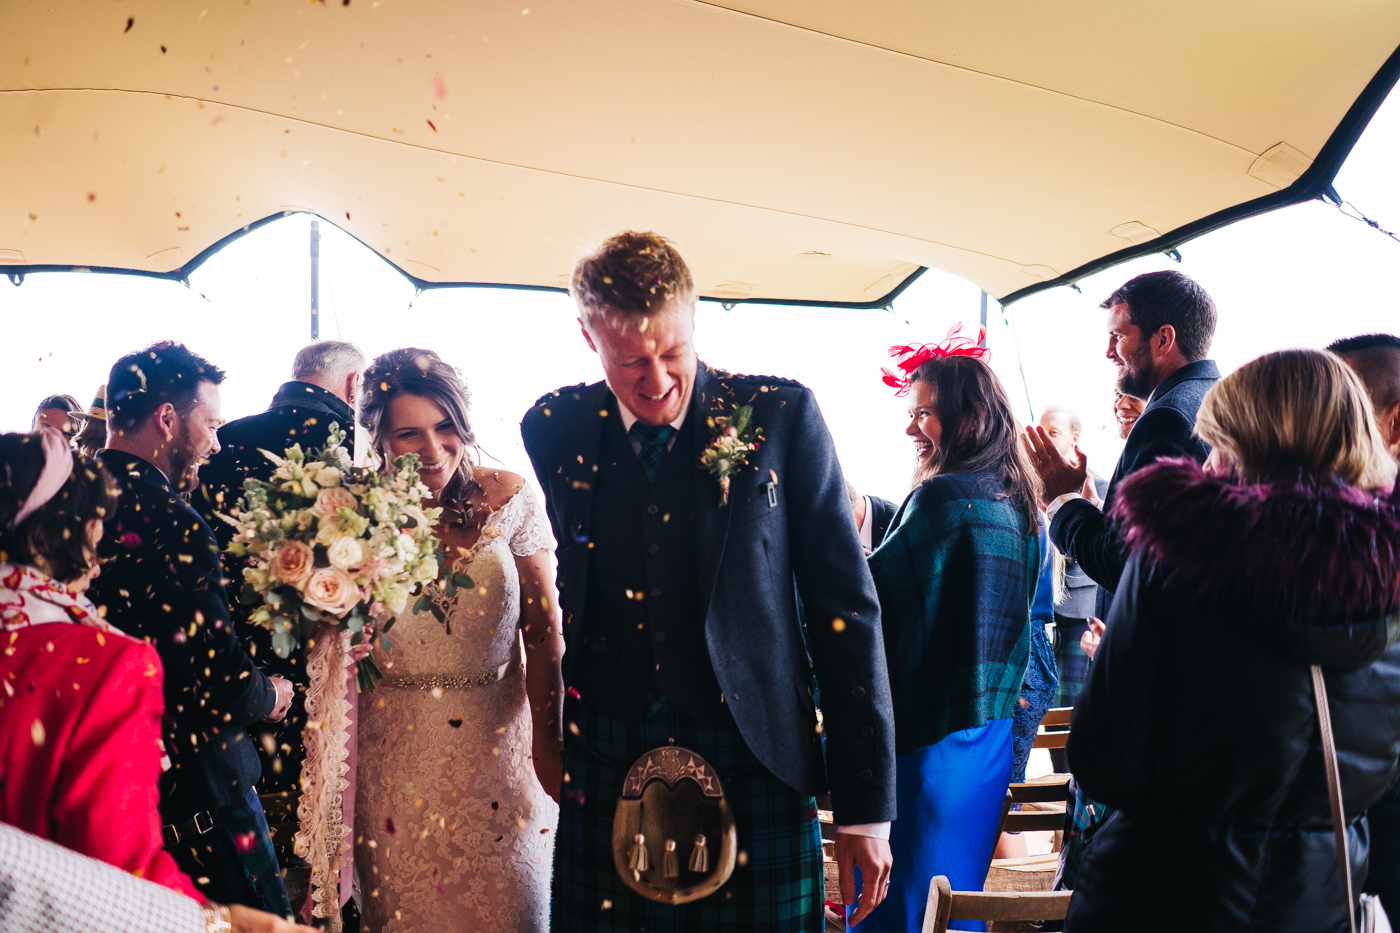 scottish-wedding-trossachs-loch-tay-highlannds-relaxed-photography-photographer-0025.jpg